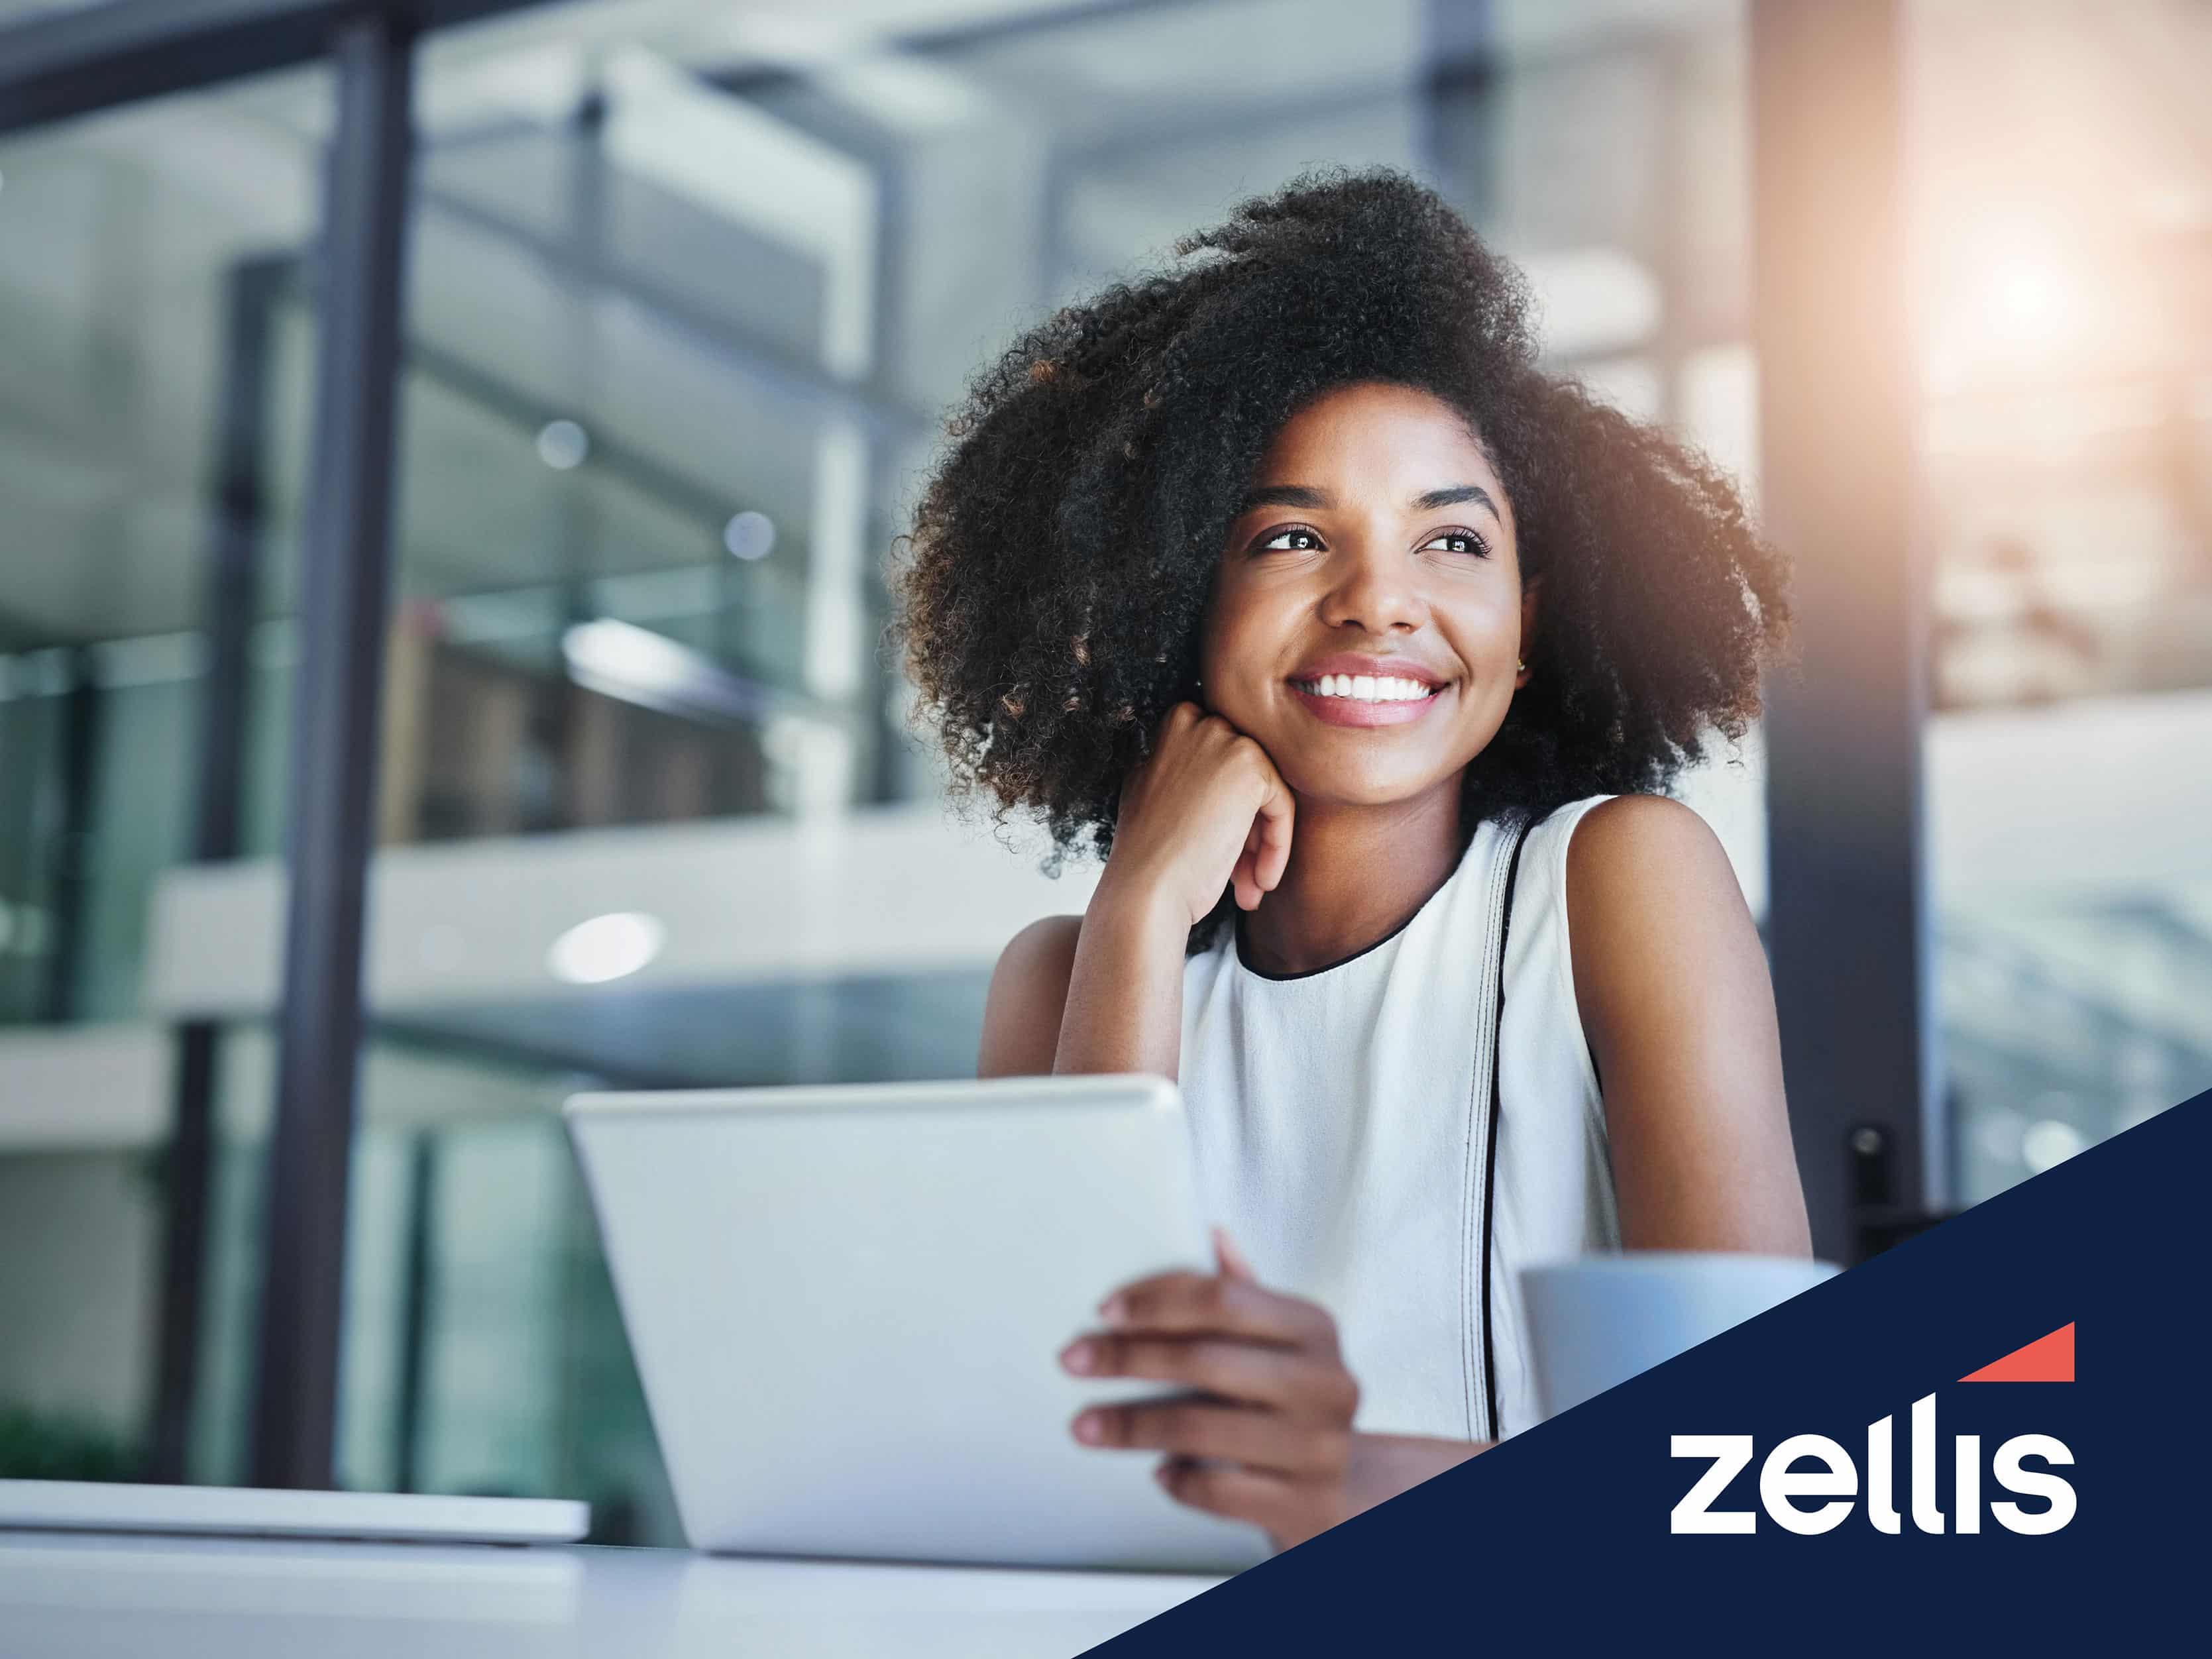 Zellis rebrand roll-out Chris Hall design